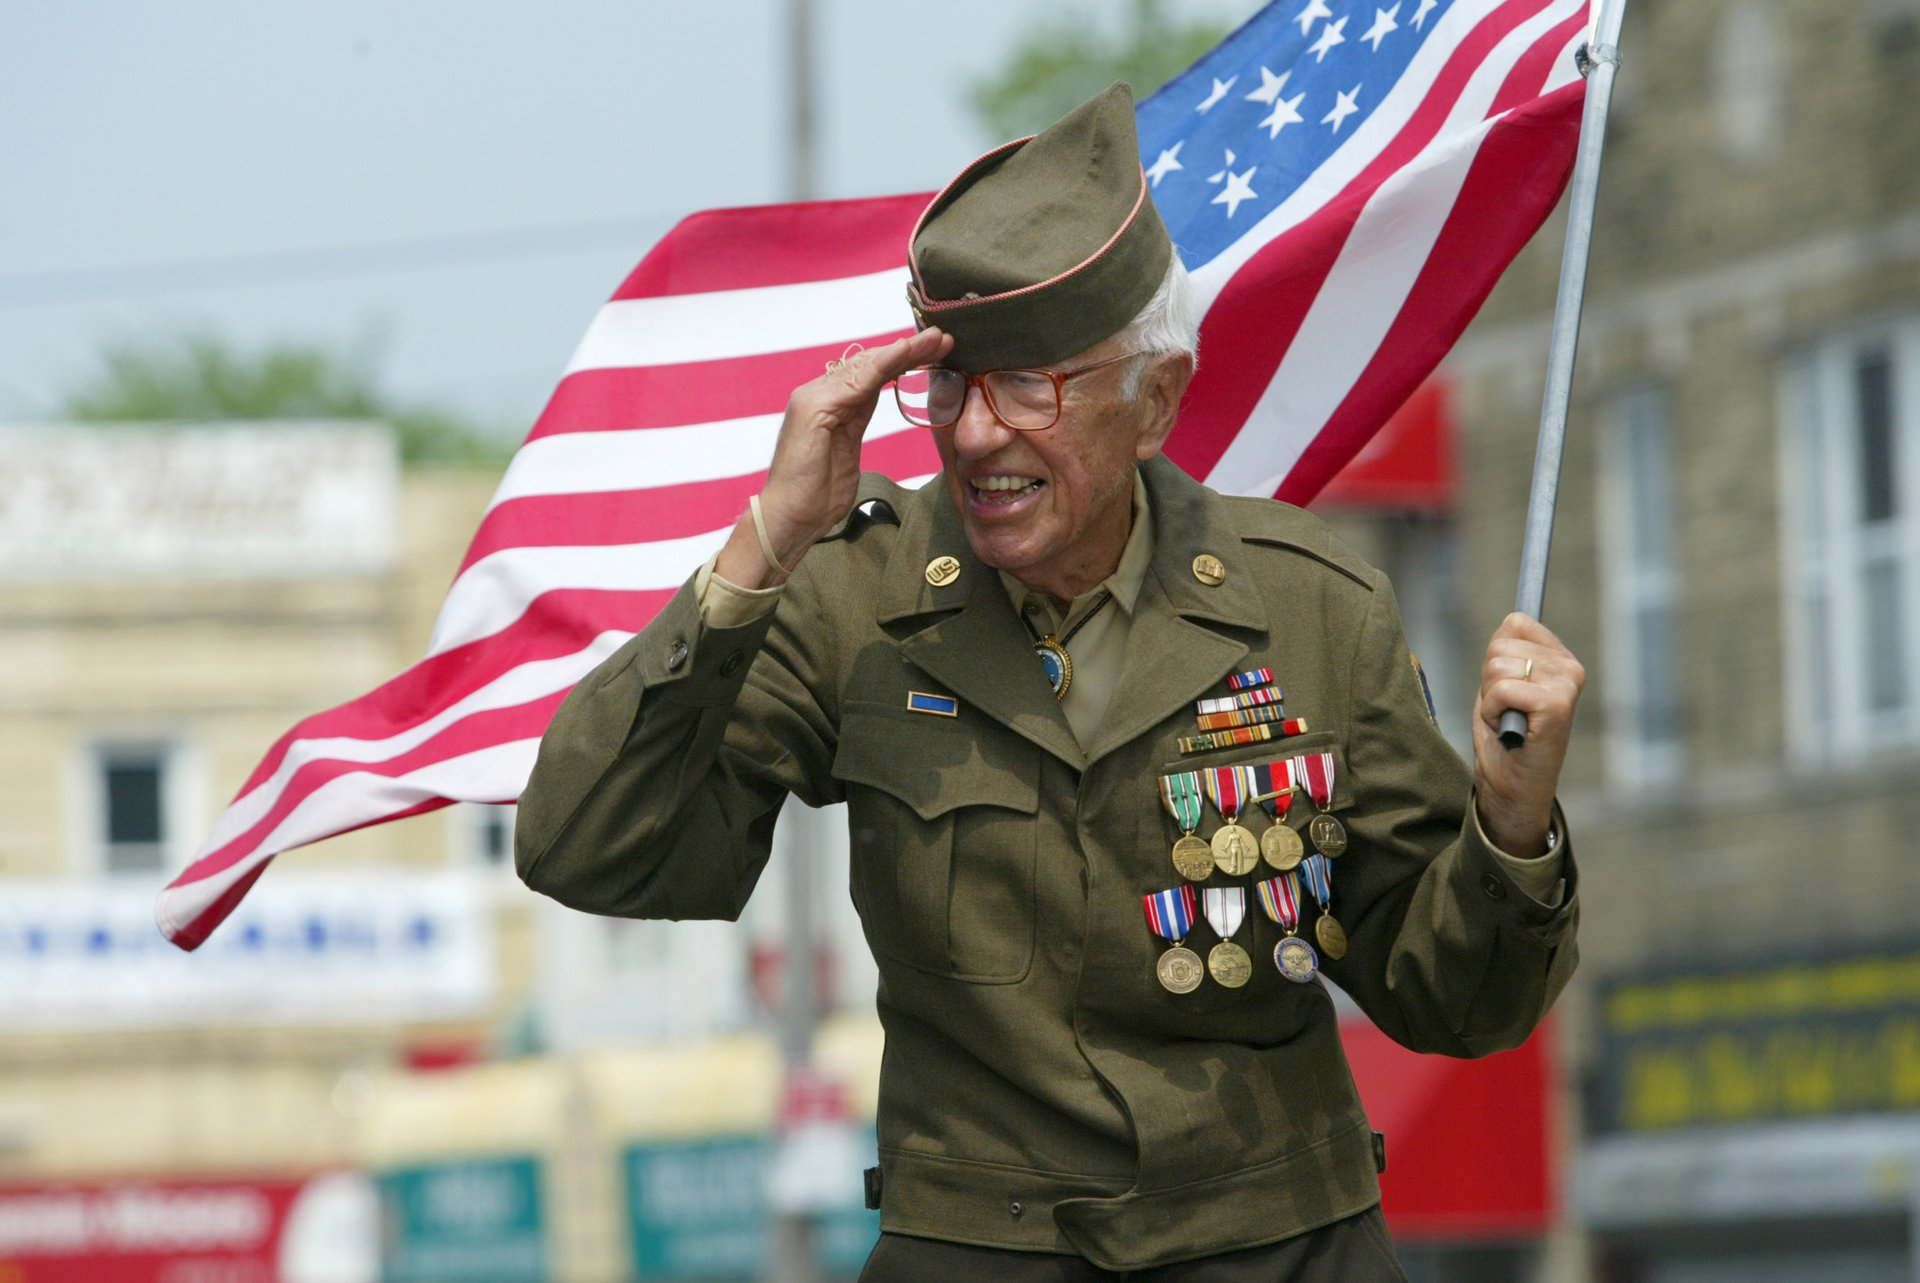 U.S. veteran with American flag